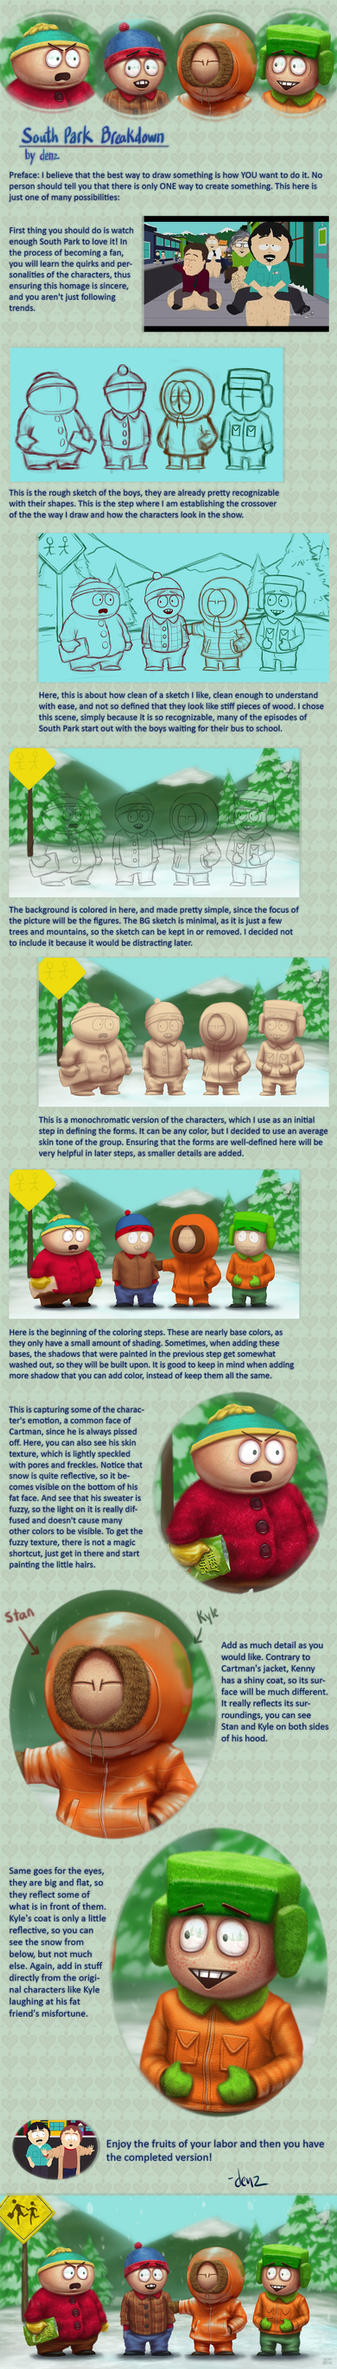 South Park Breakdown by DenzelAJackson